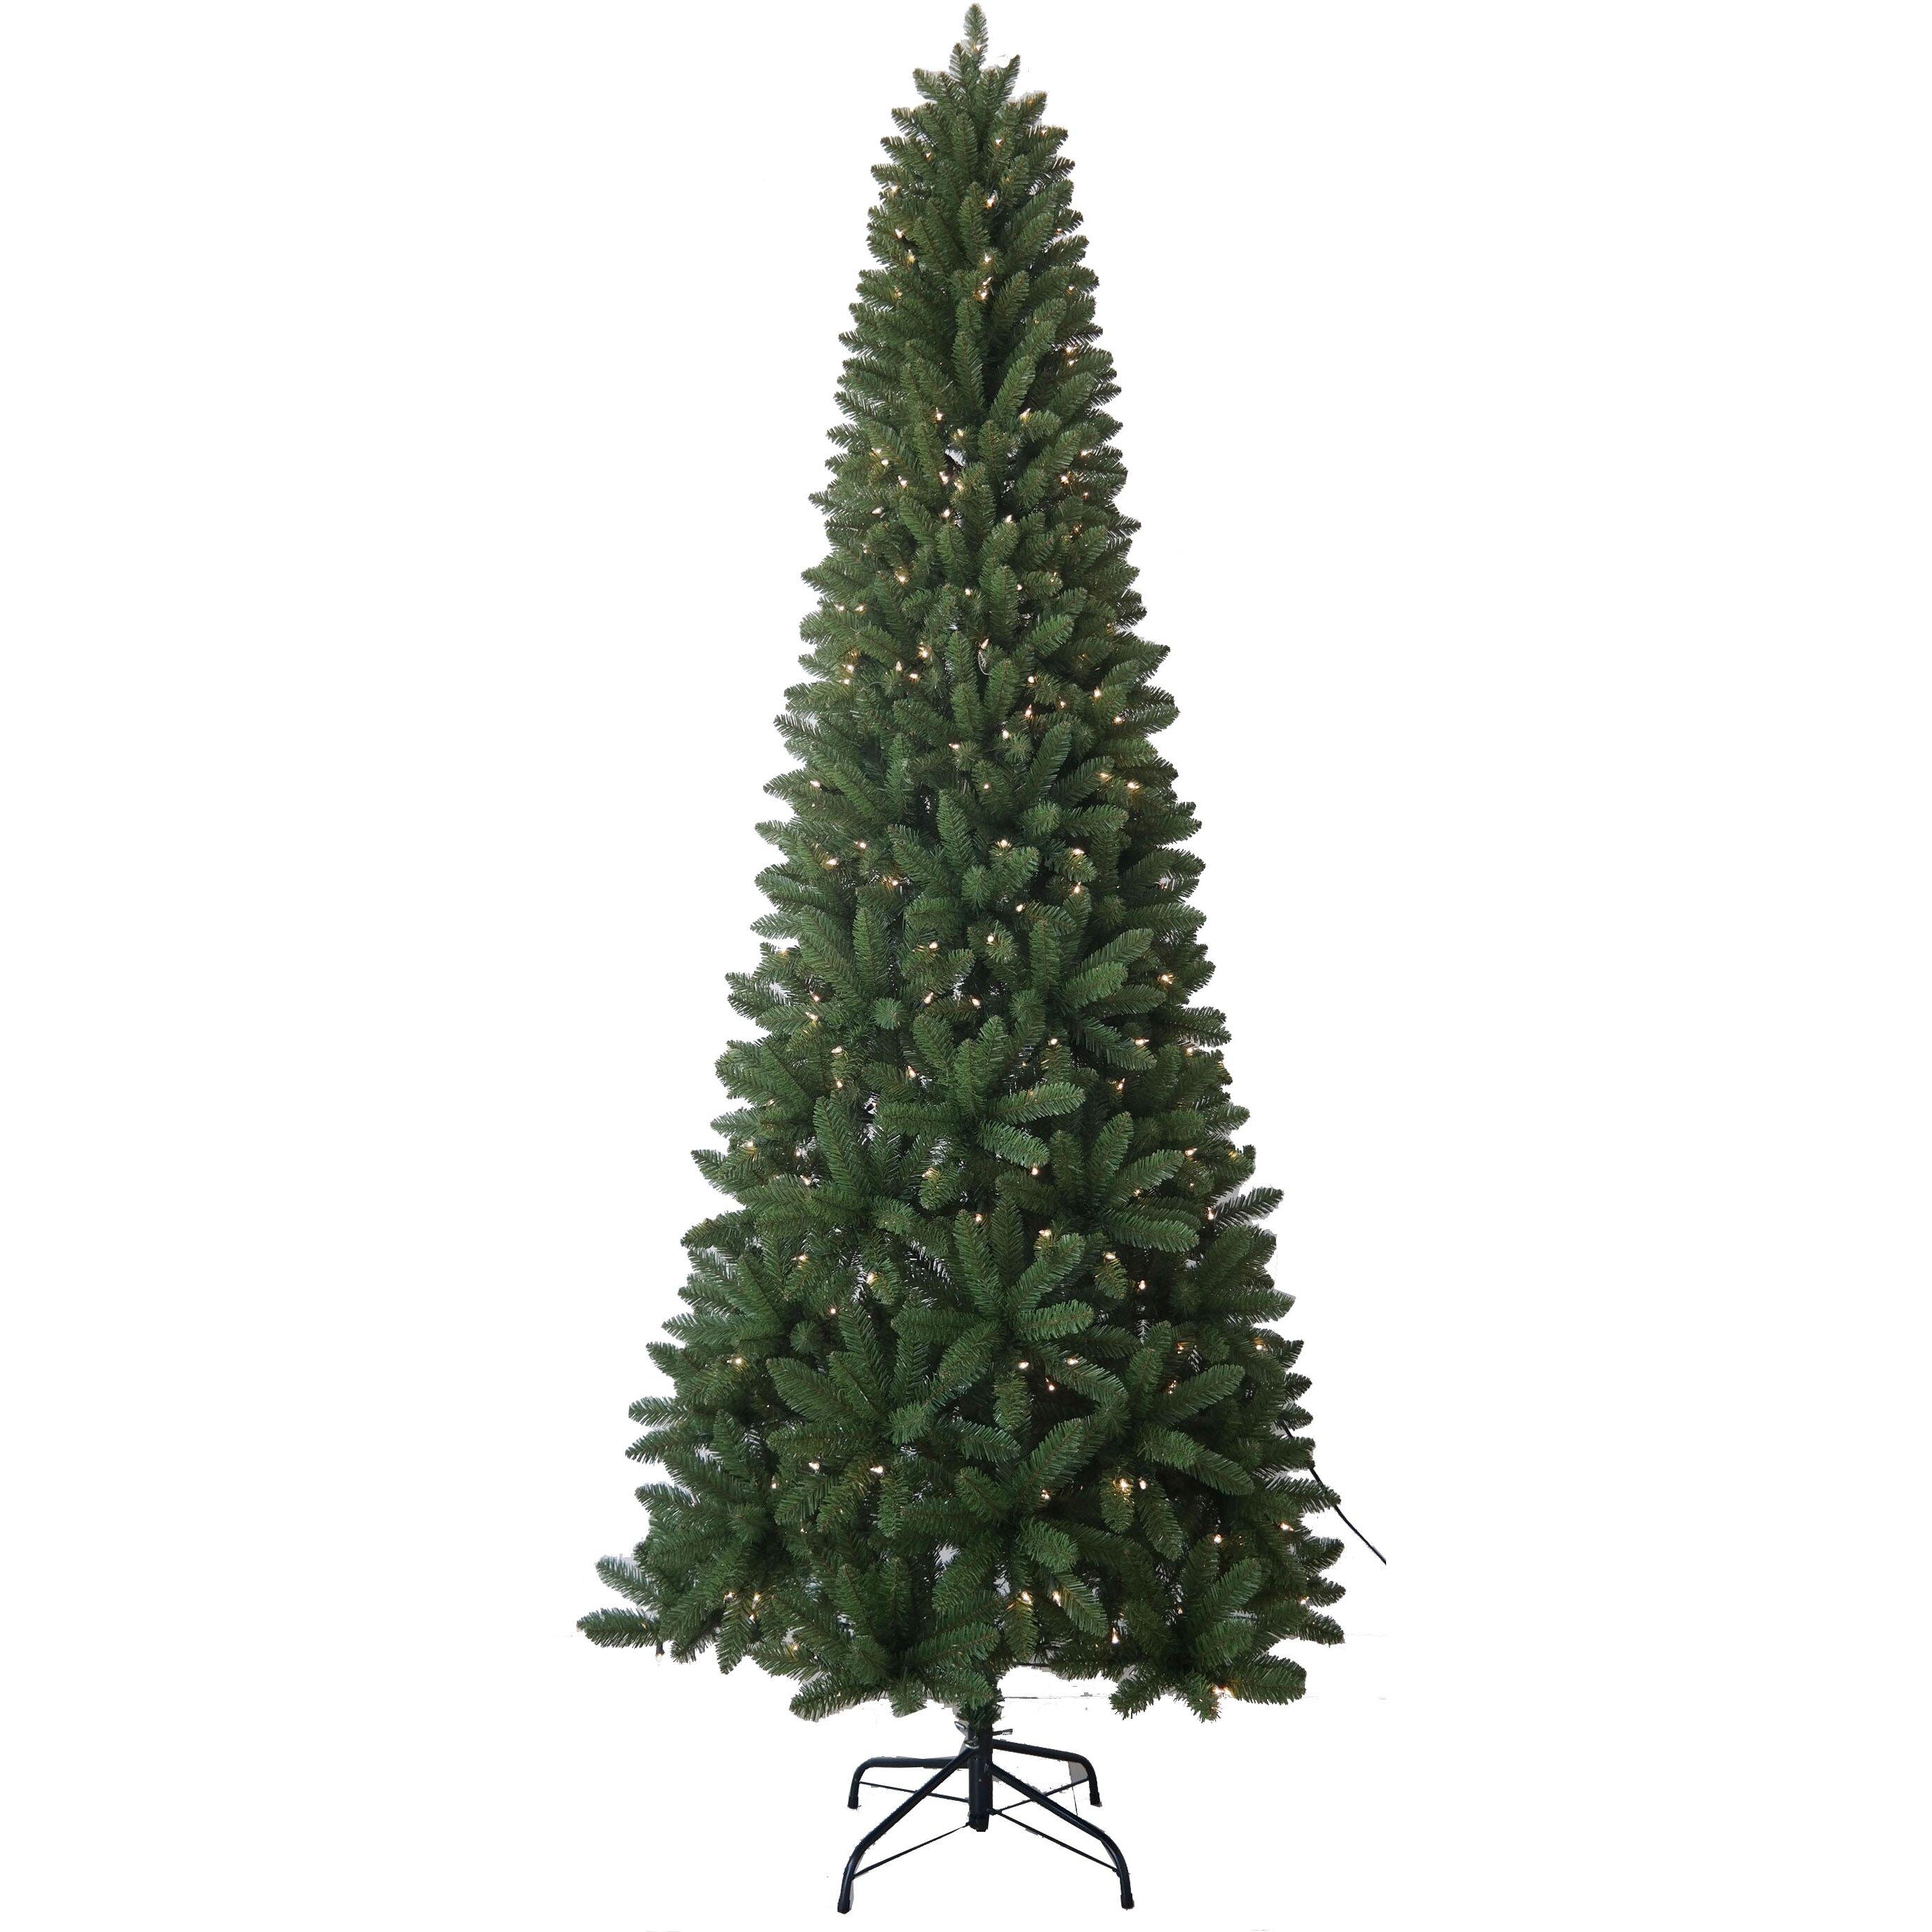 Next Slim Christmas Tree: Santa's Workshop 9' Slim Artificial Christmas Tree With